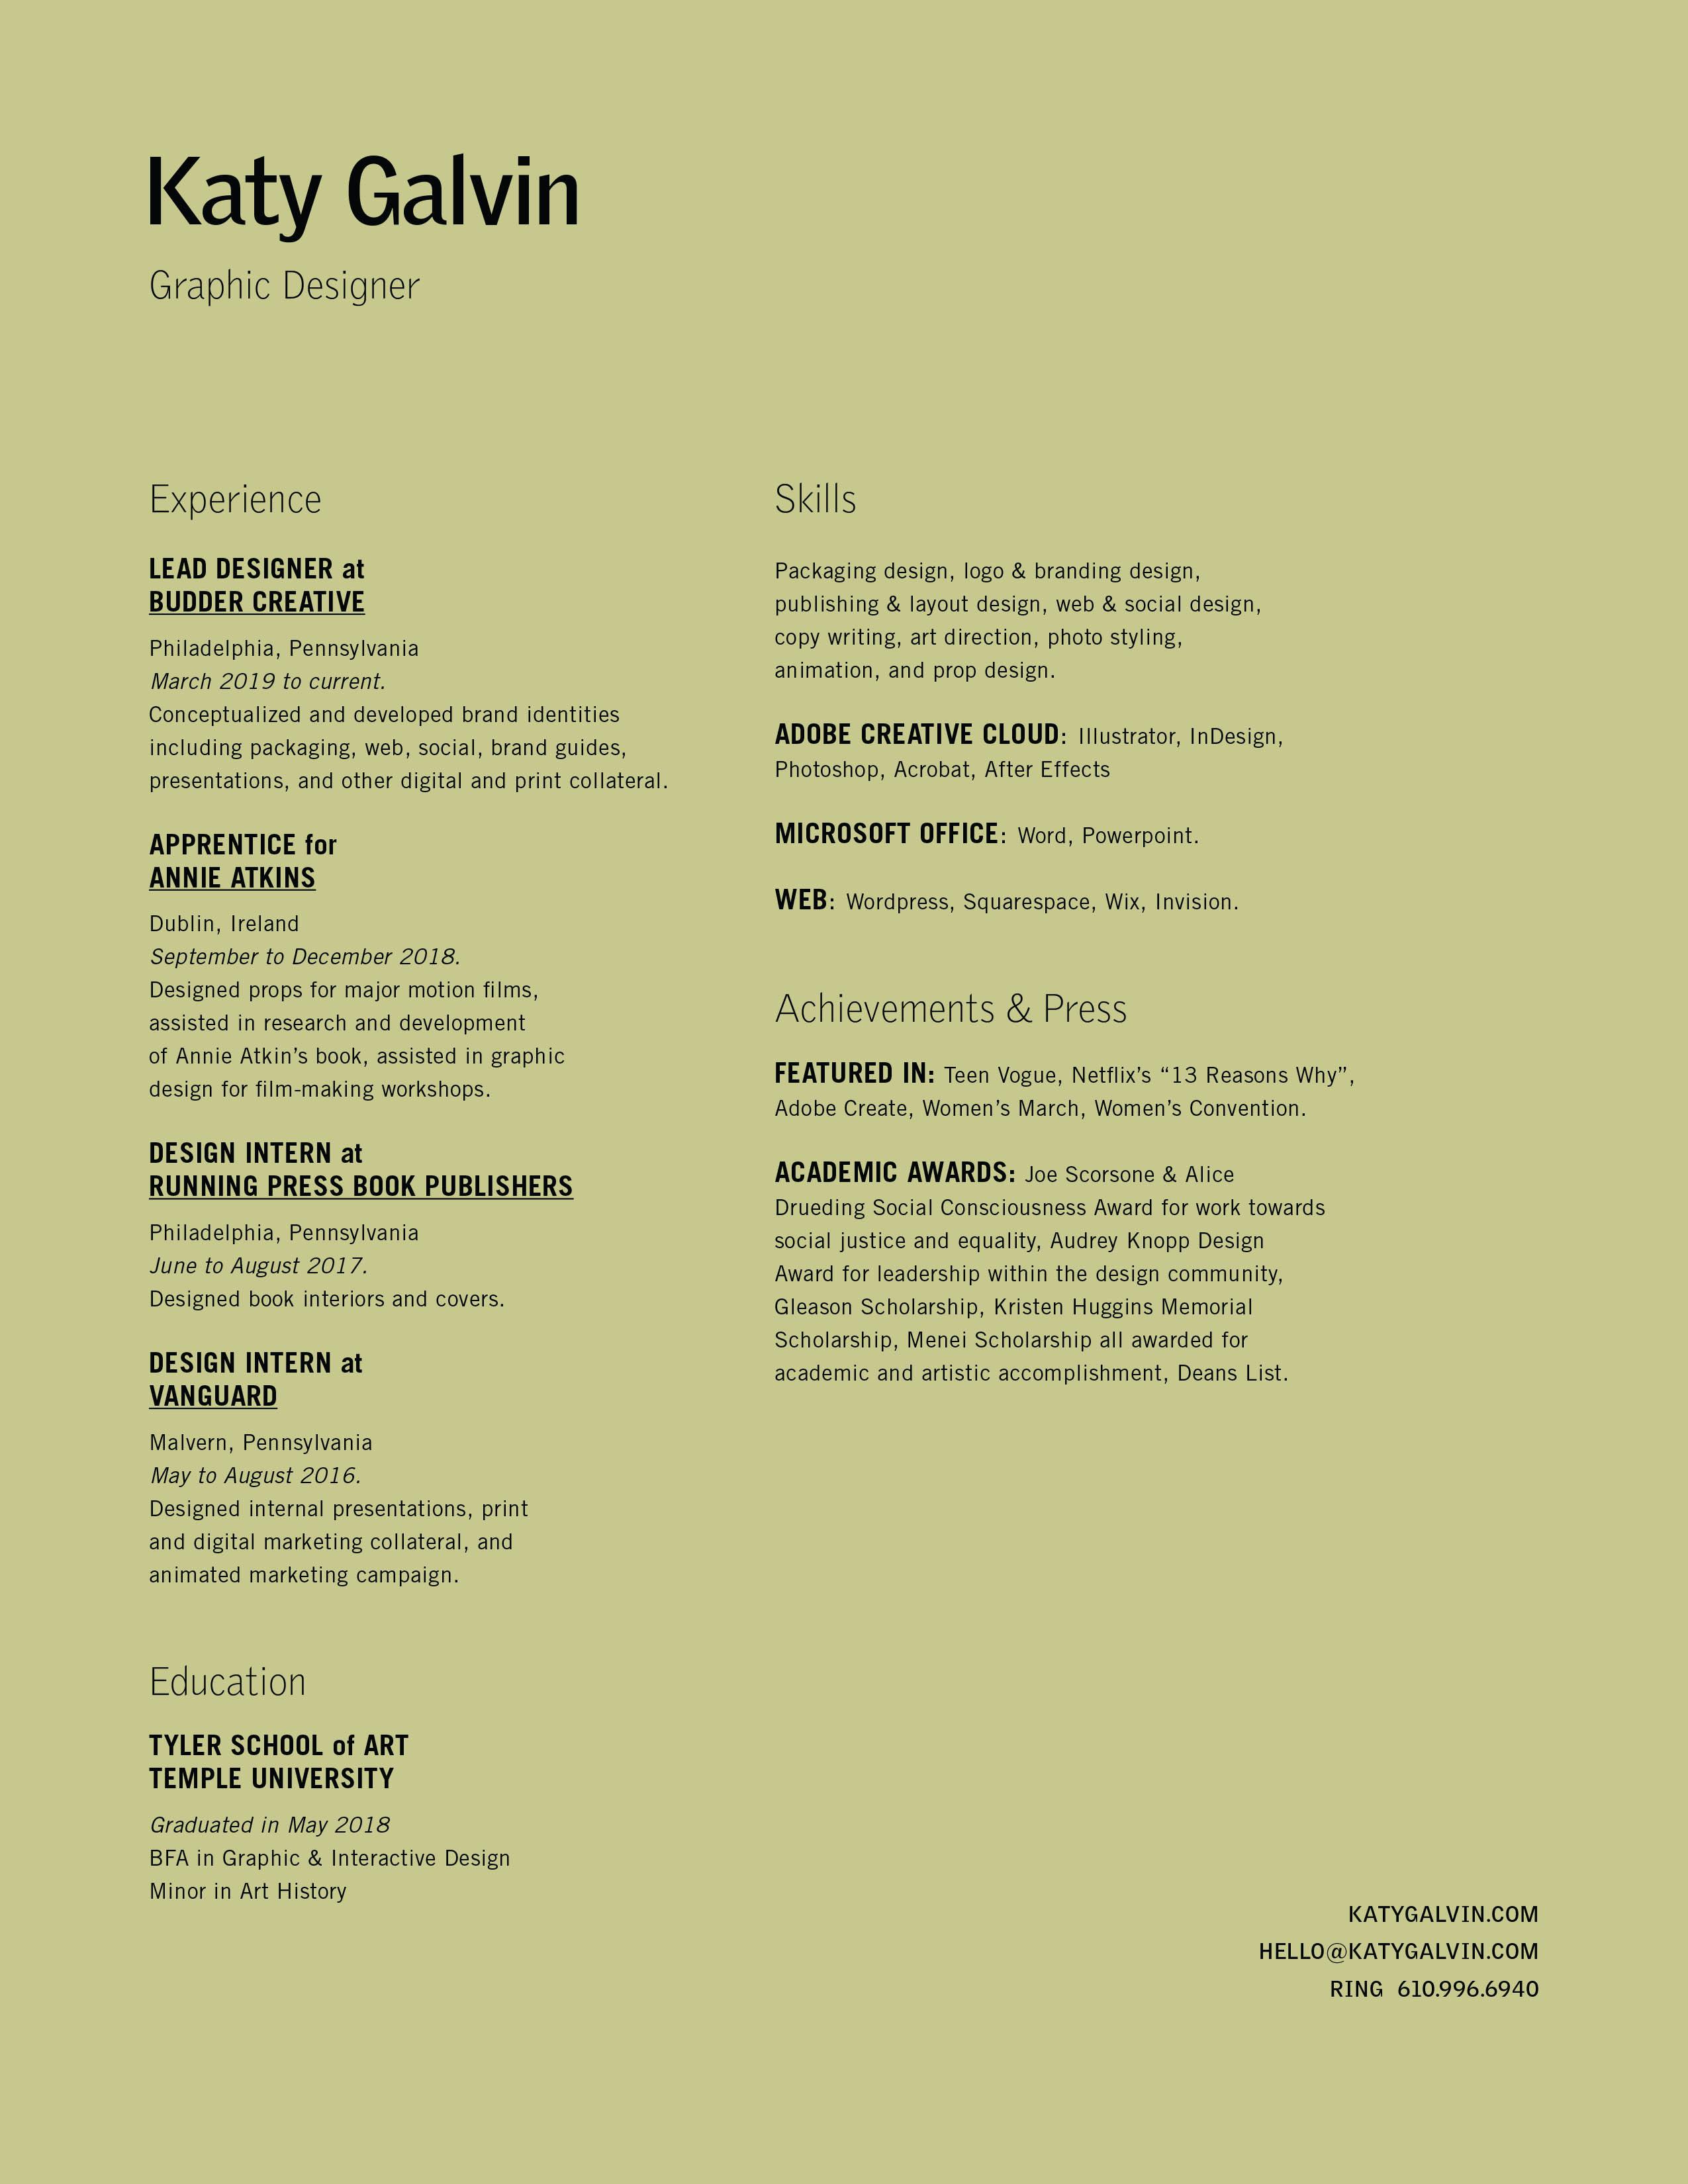 kg-resume